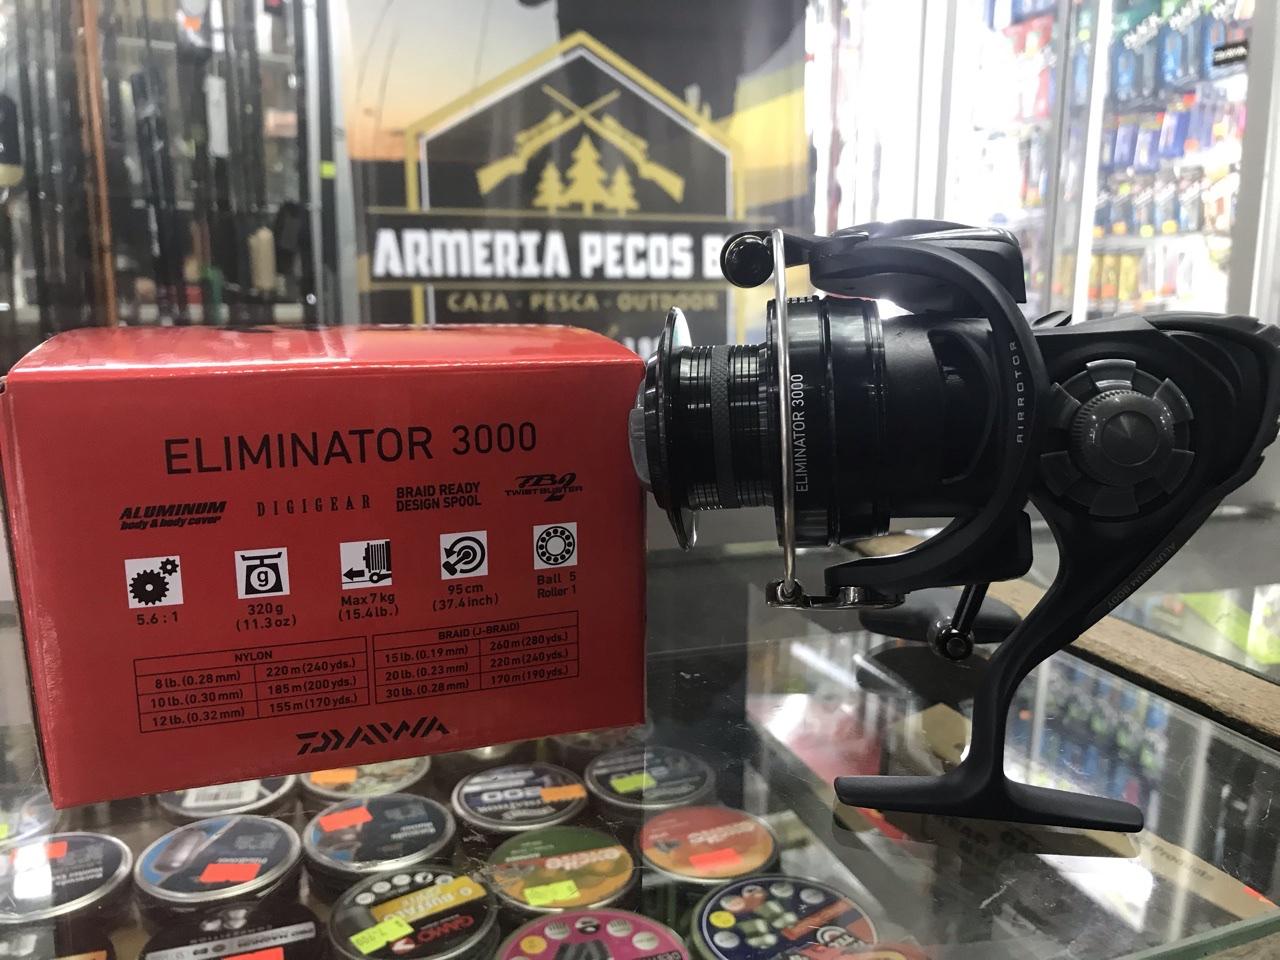 Carrete Daiwa Eliminator 3000